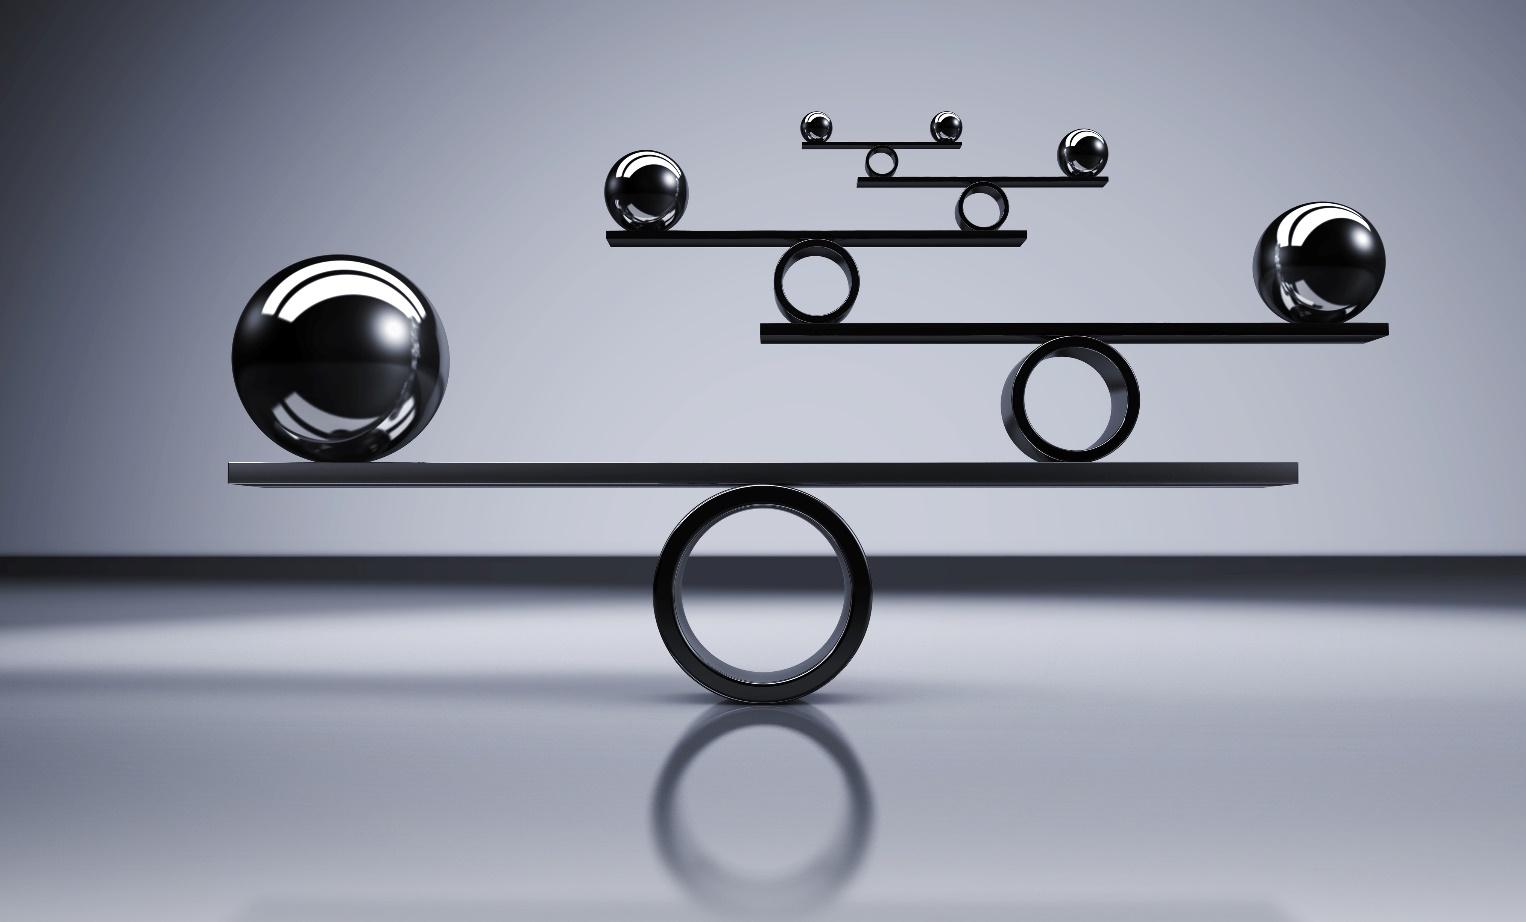 A digital balance scale using circles